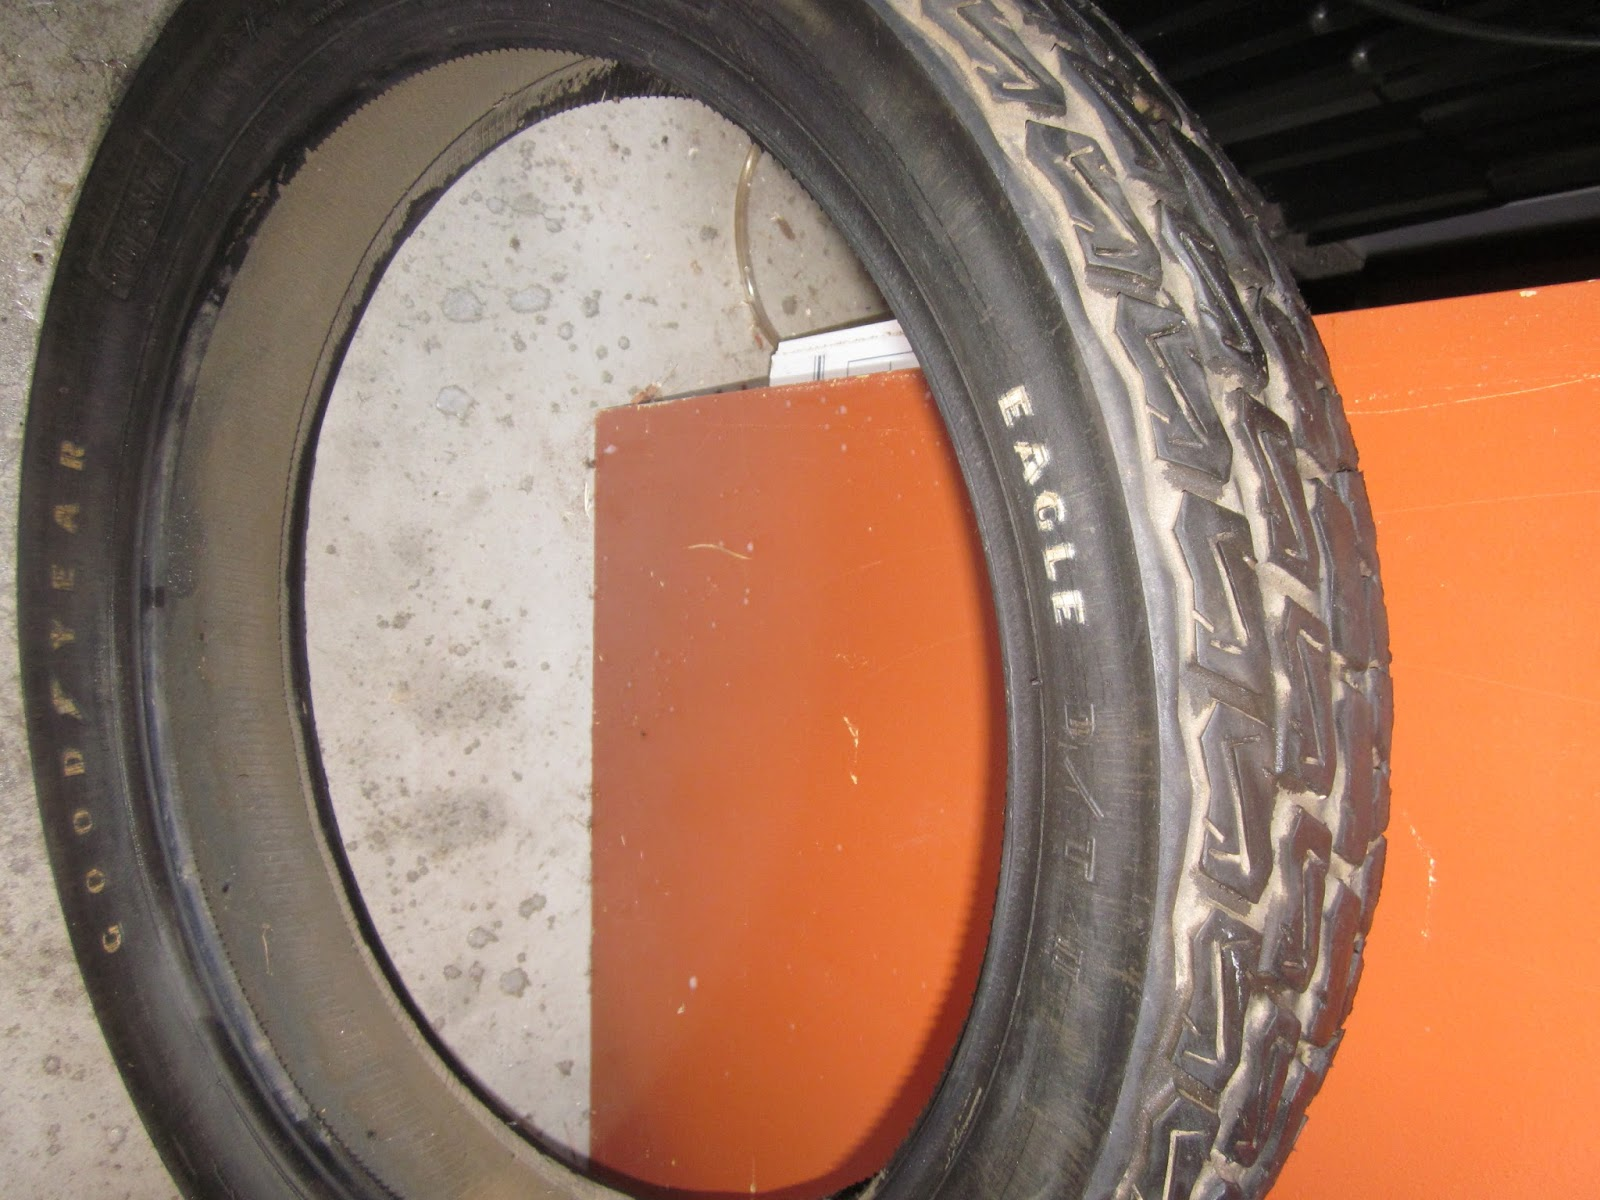 OldMotoDude: Good Year Eagle Dirt Track Tire mounted on